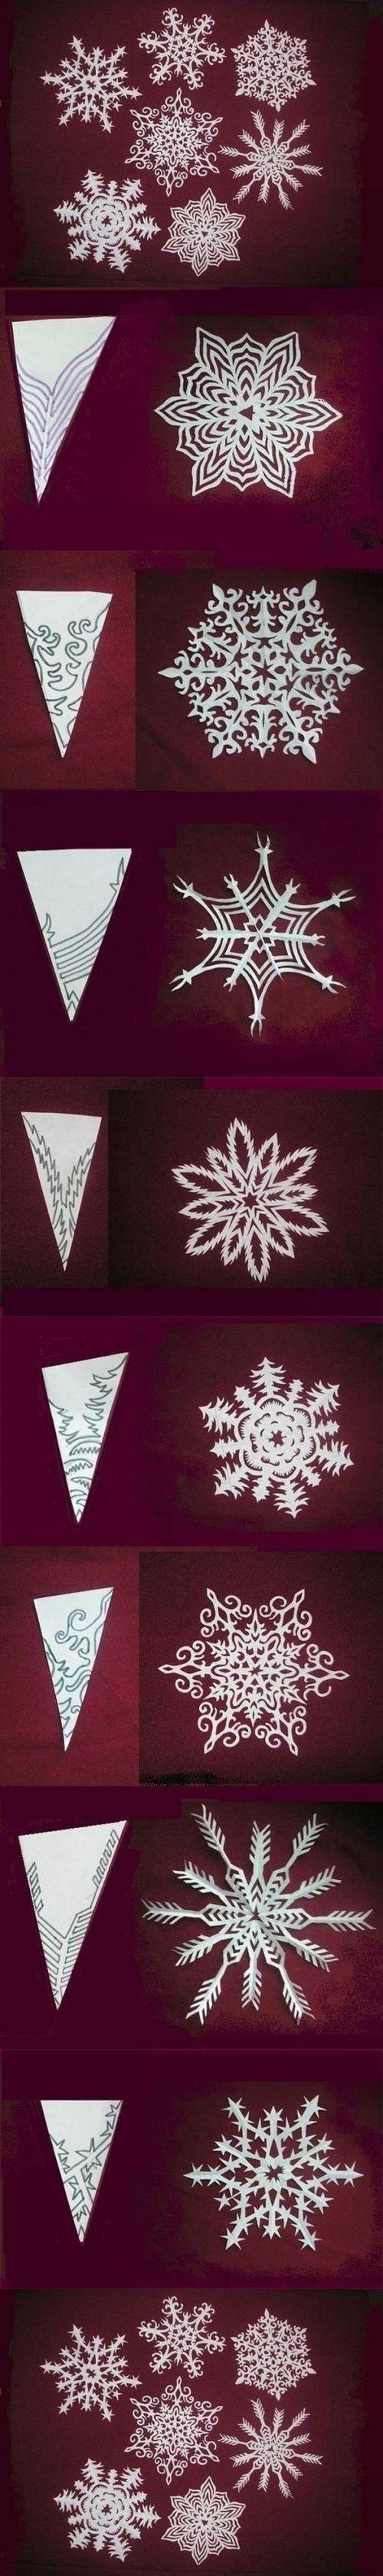 Paper Snowflake Patterns! So Pretty & Fun To Do! ❄️